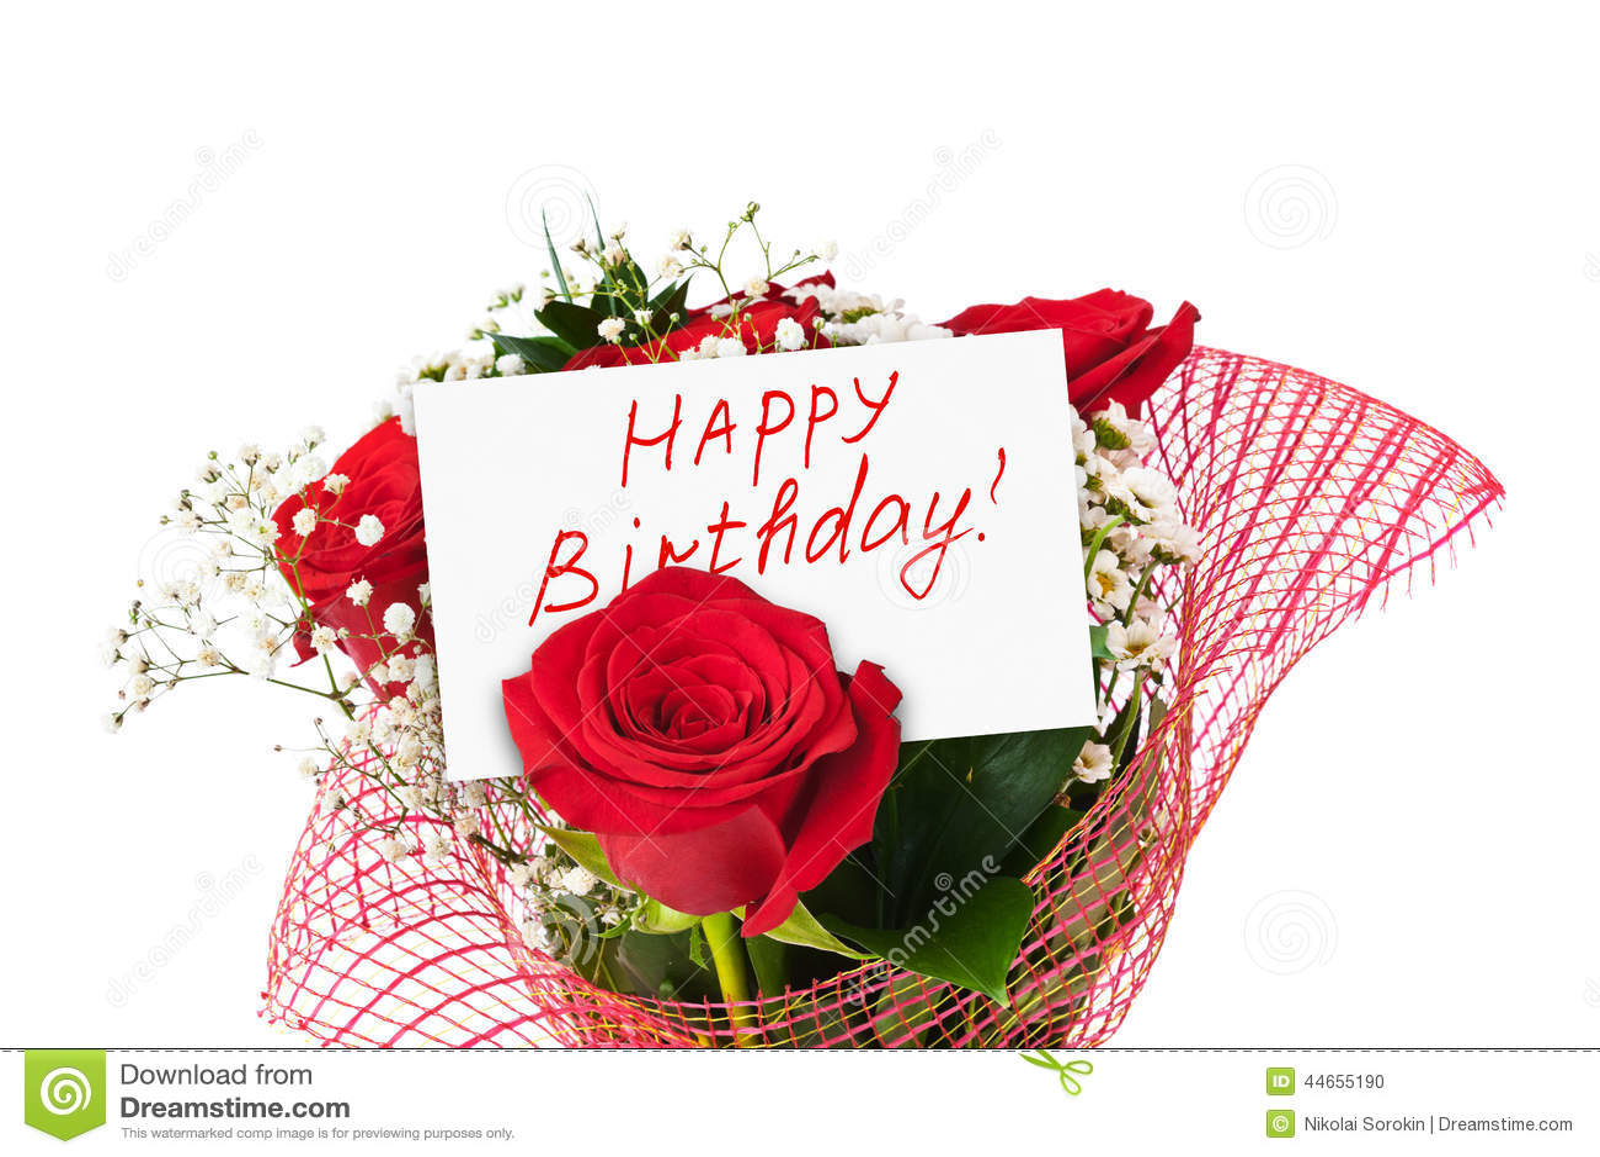 Roses and card happy birthday stock image image of happiness roses bouquet and card happy birthday stock photo izmirmasajfo